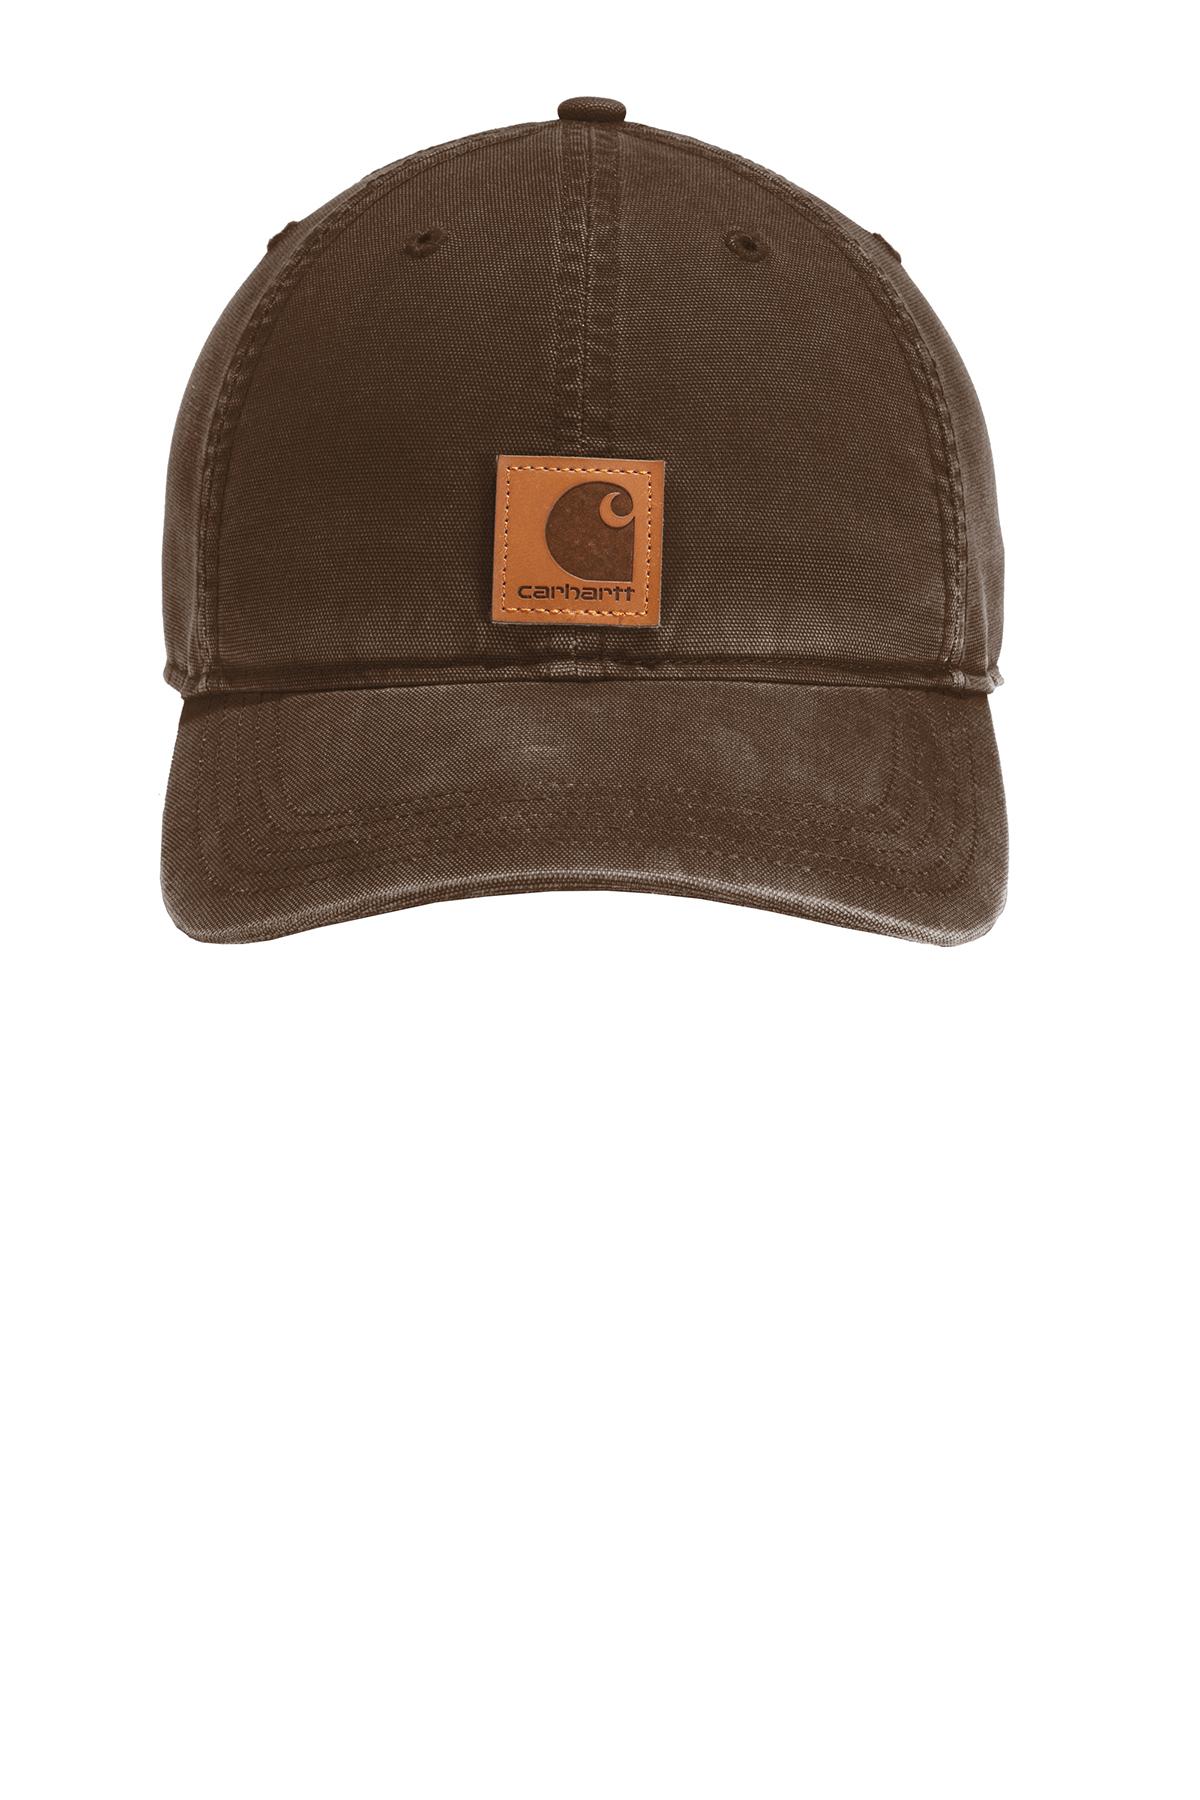 da90d1bd6f31e Carhartt ® Odessa Cap